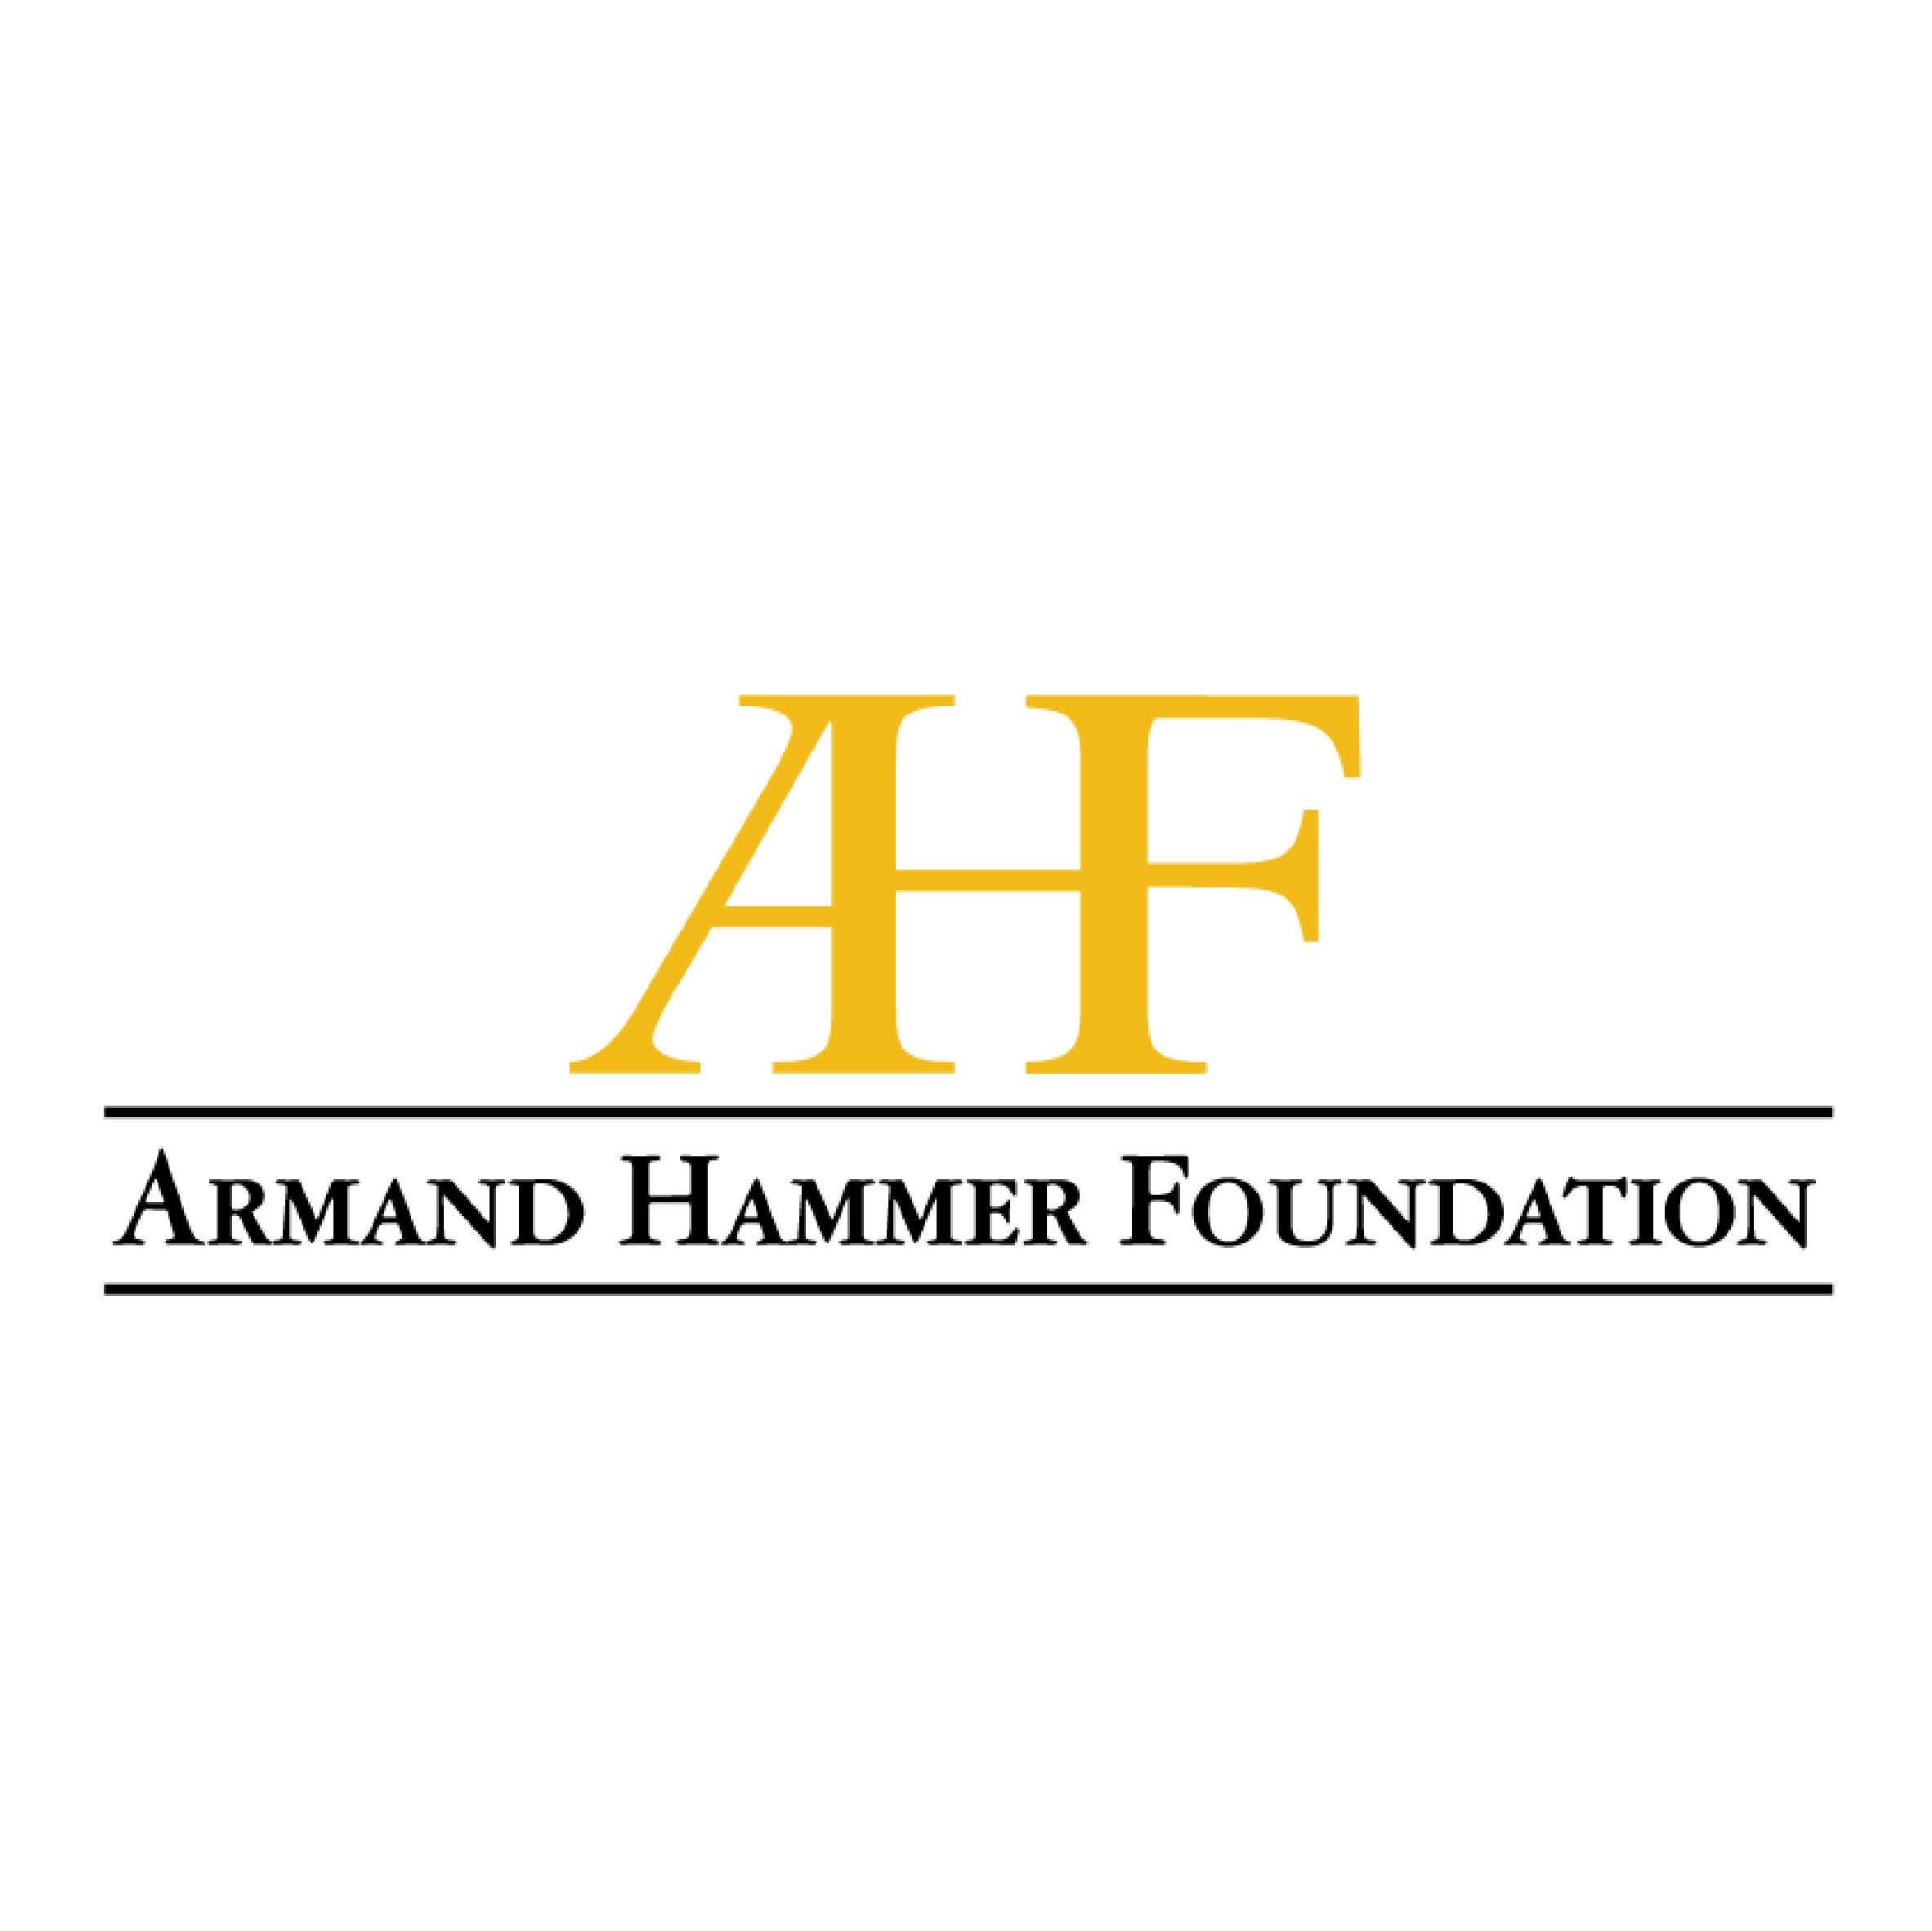 Armand Hammer Foundation logo.